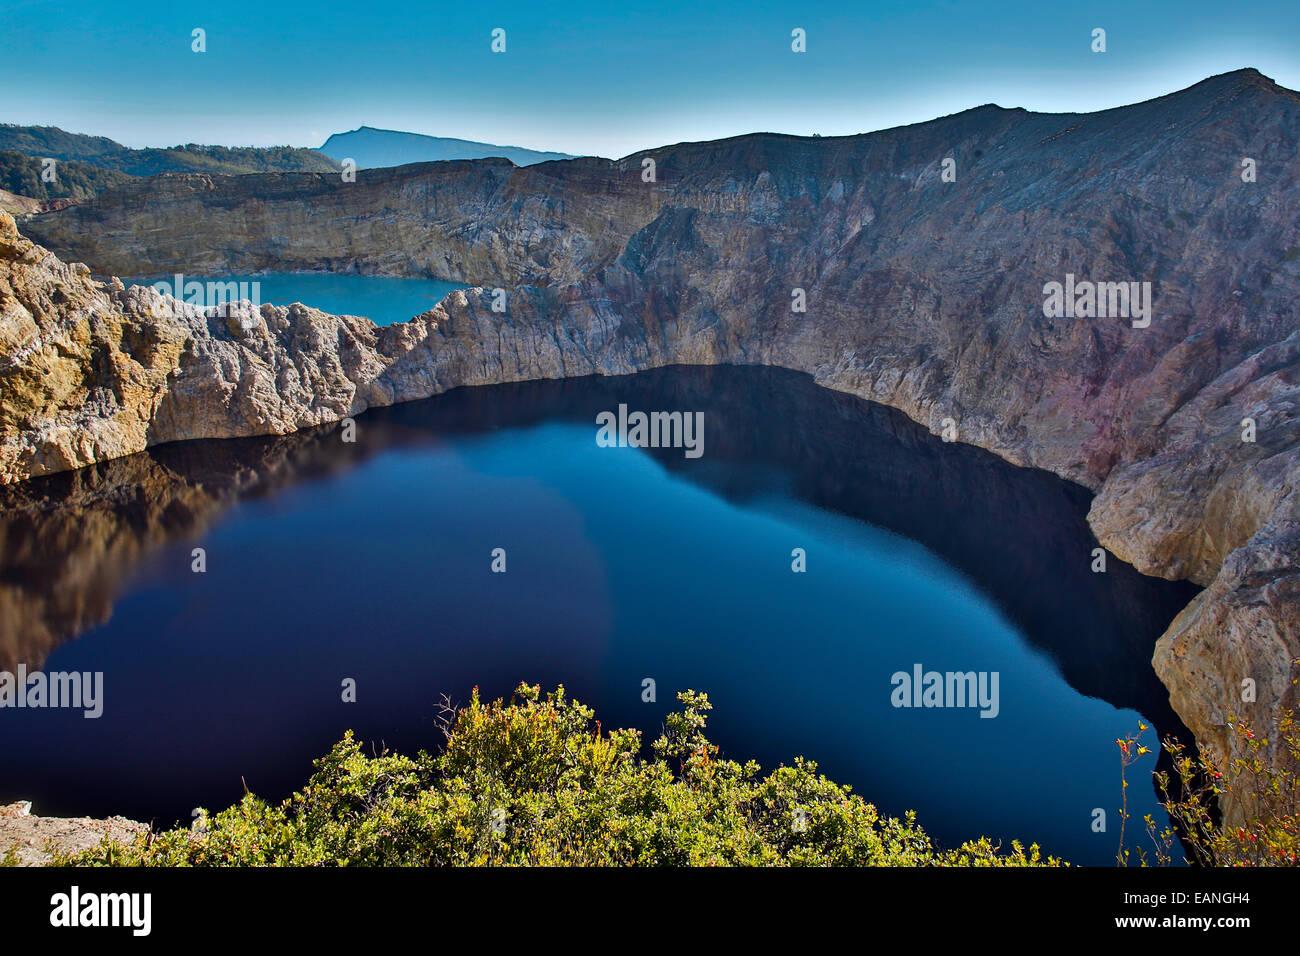 Kelimutu volcano crater lakes and caldera, Flores Island, Indonesia - Stock Image